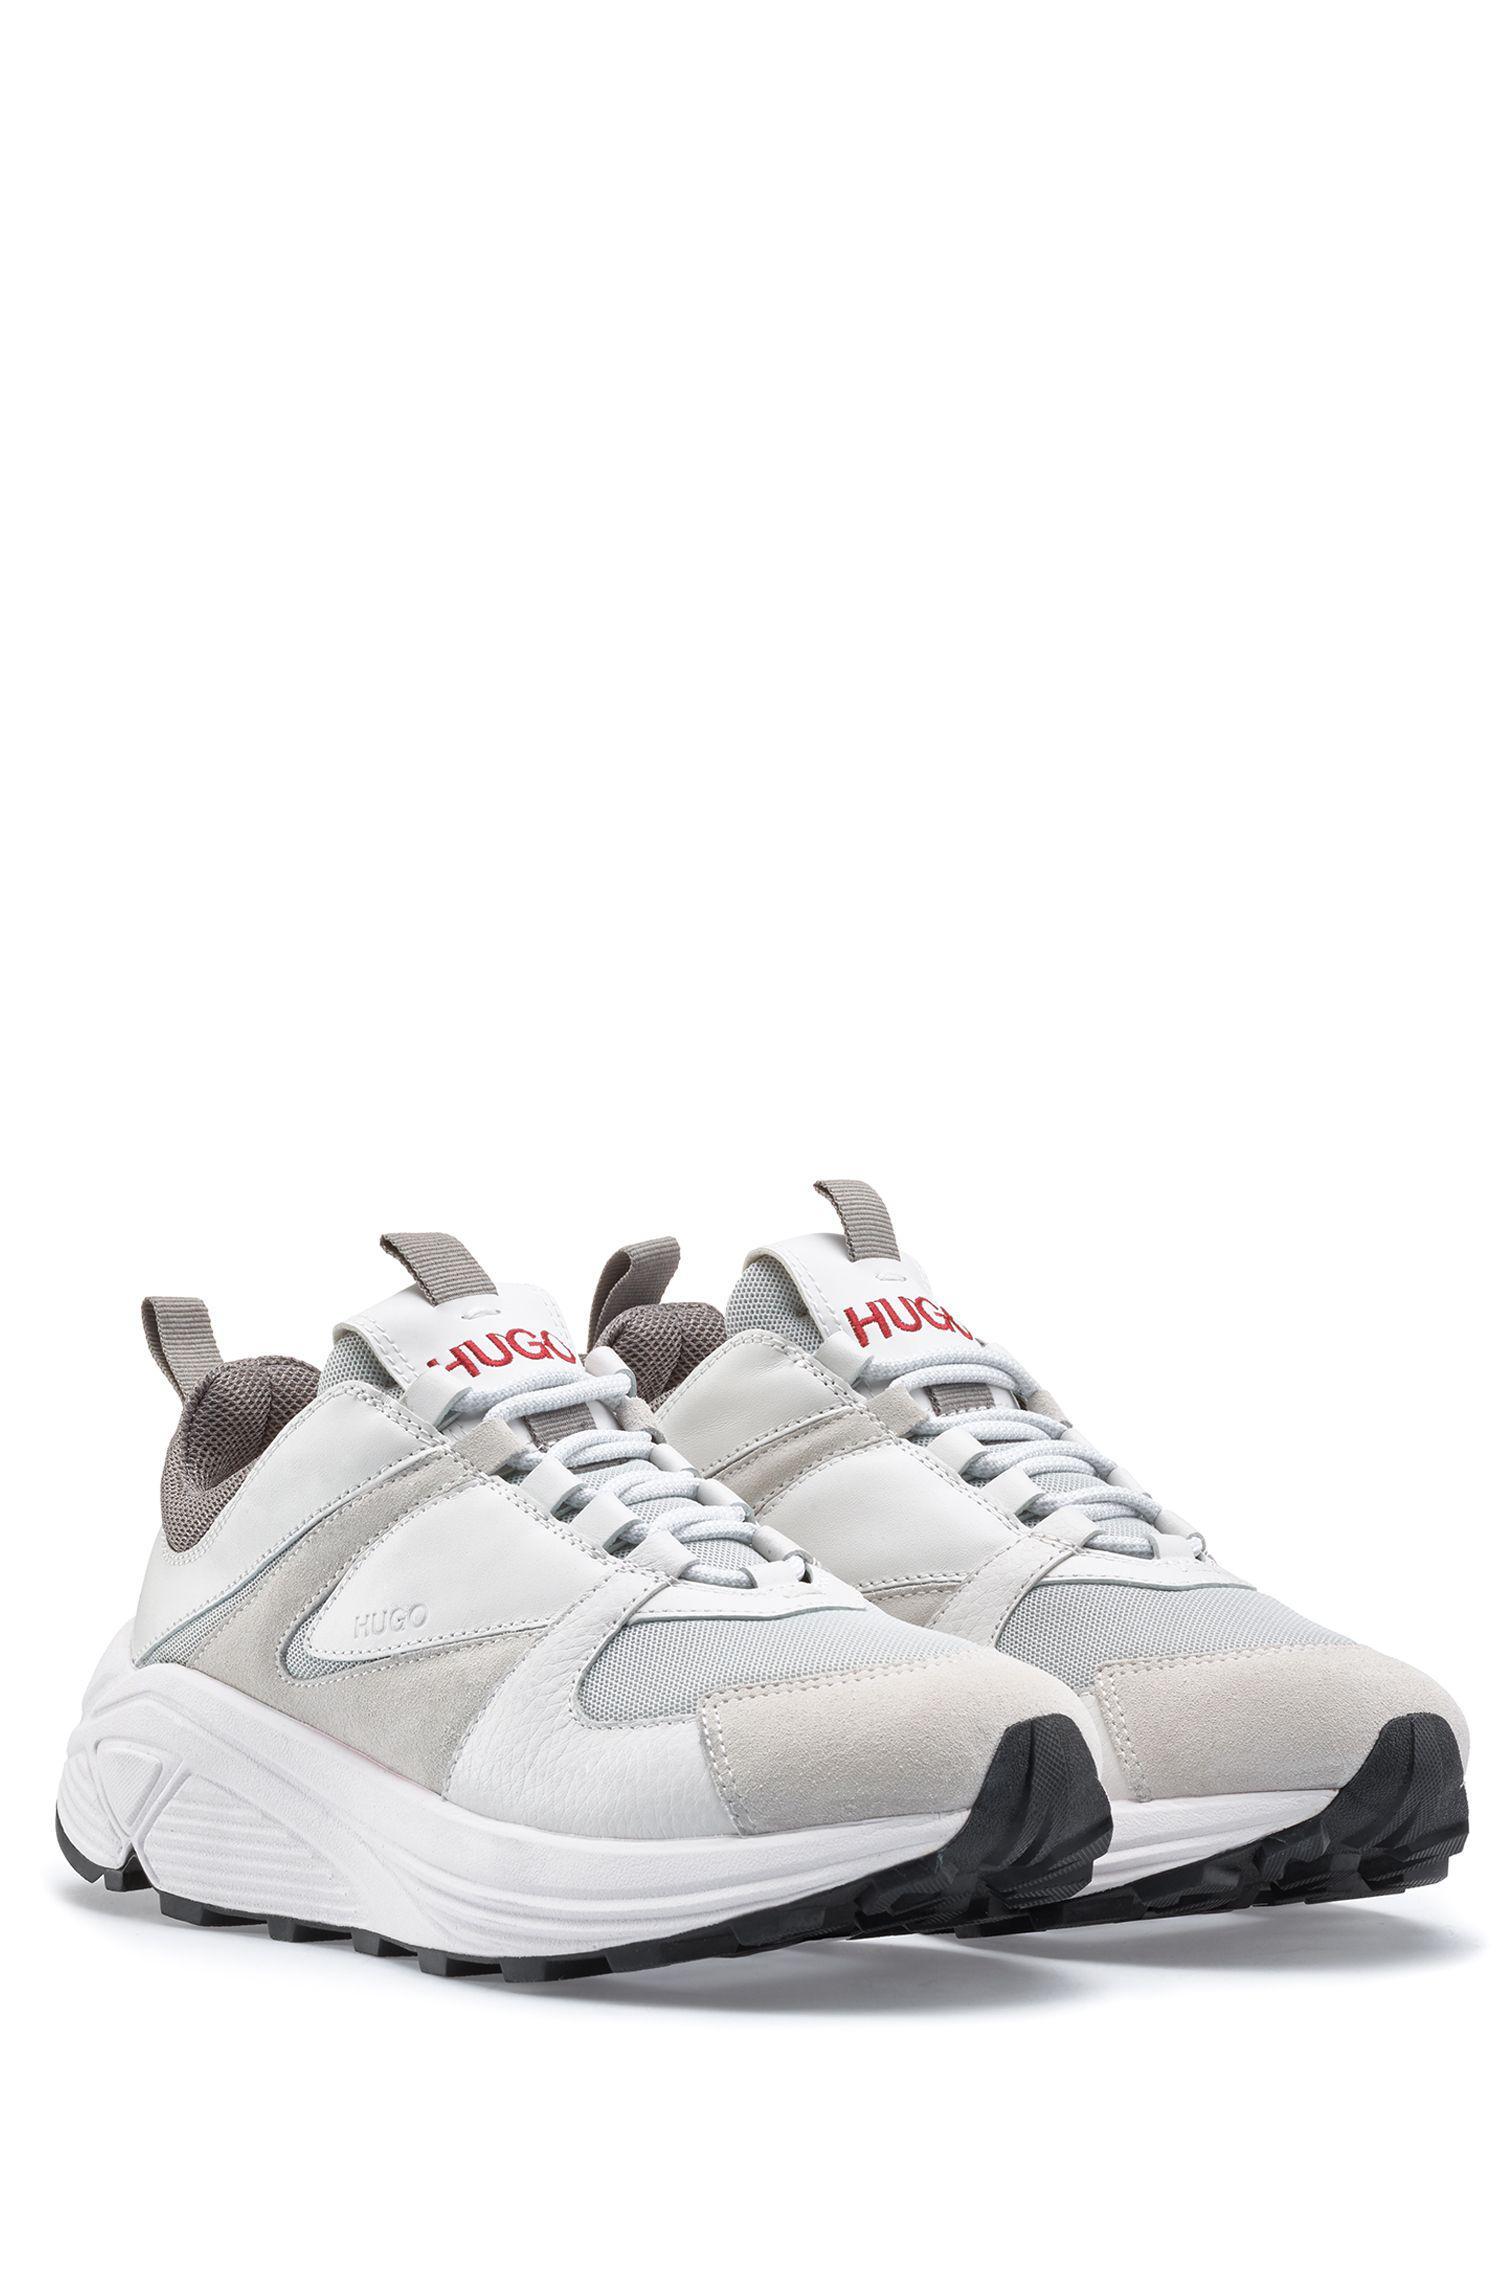 401ecb1ee81 HUGO - White Chunky Running-style Sneakers In Mesh